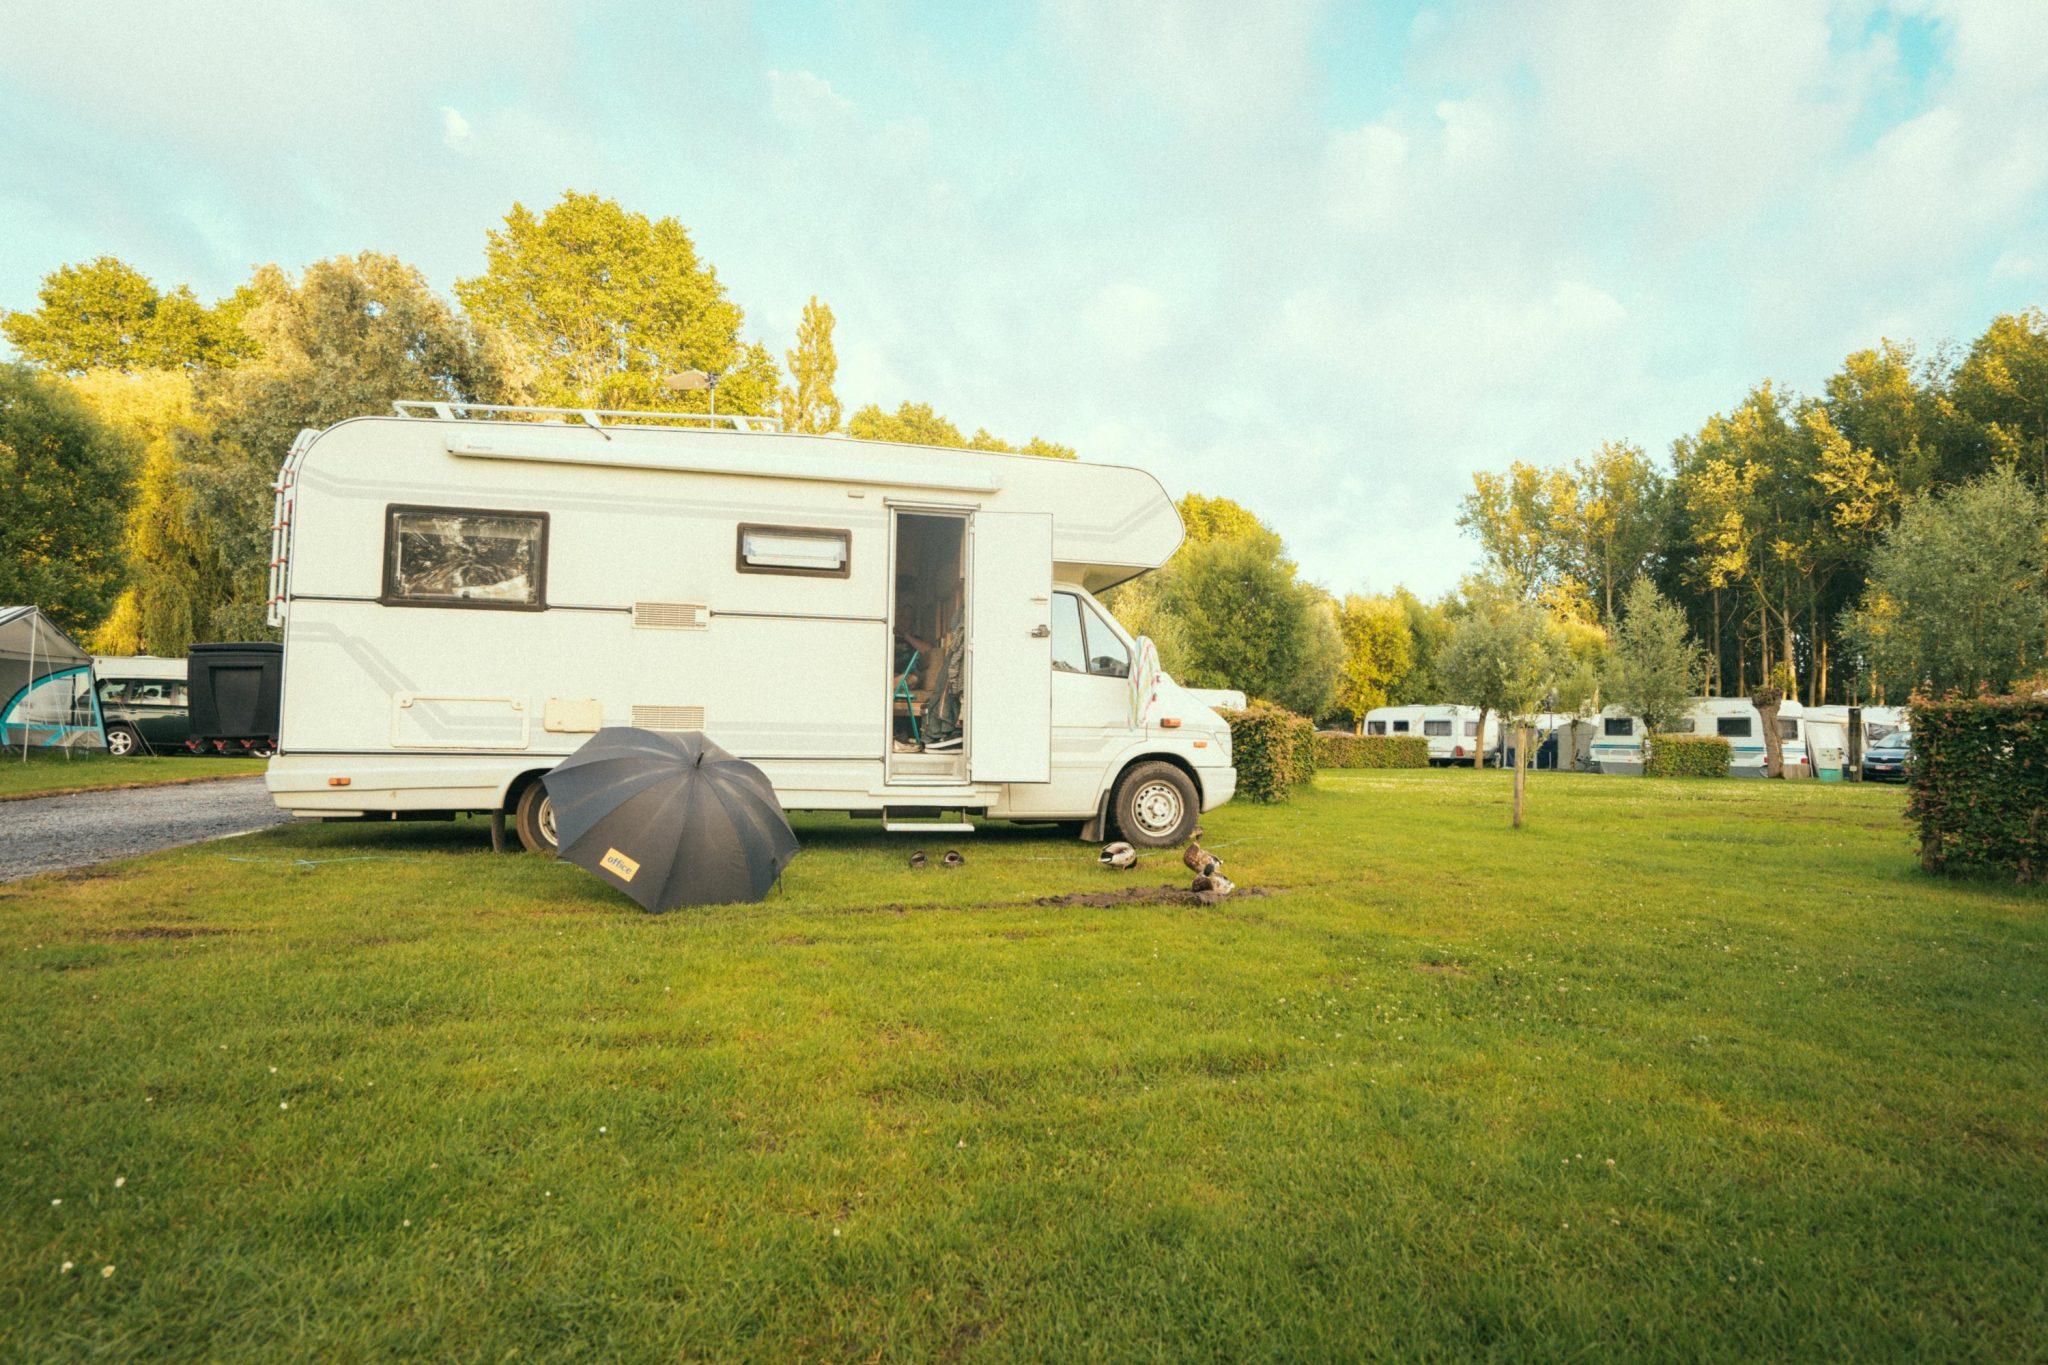 Camping Groeneveld - Camper mobilehome in het groen